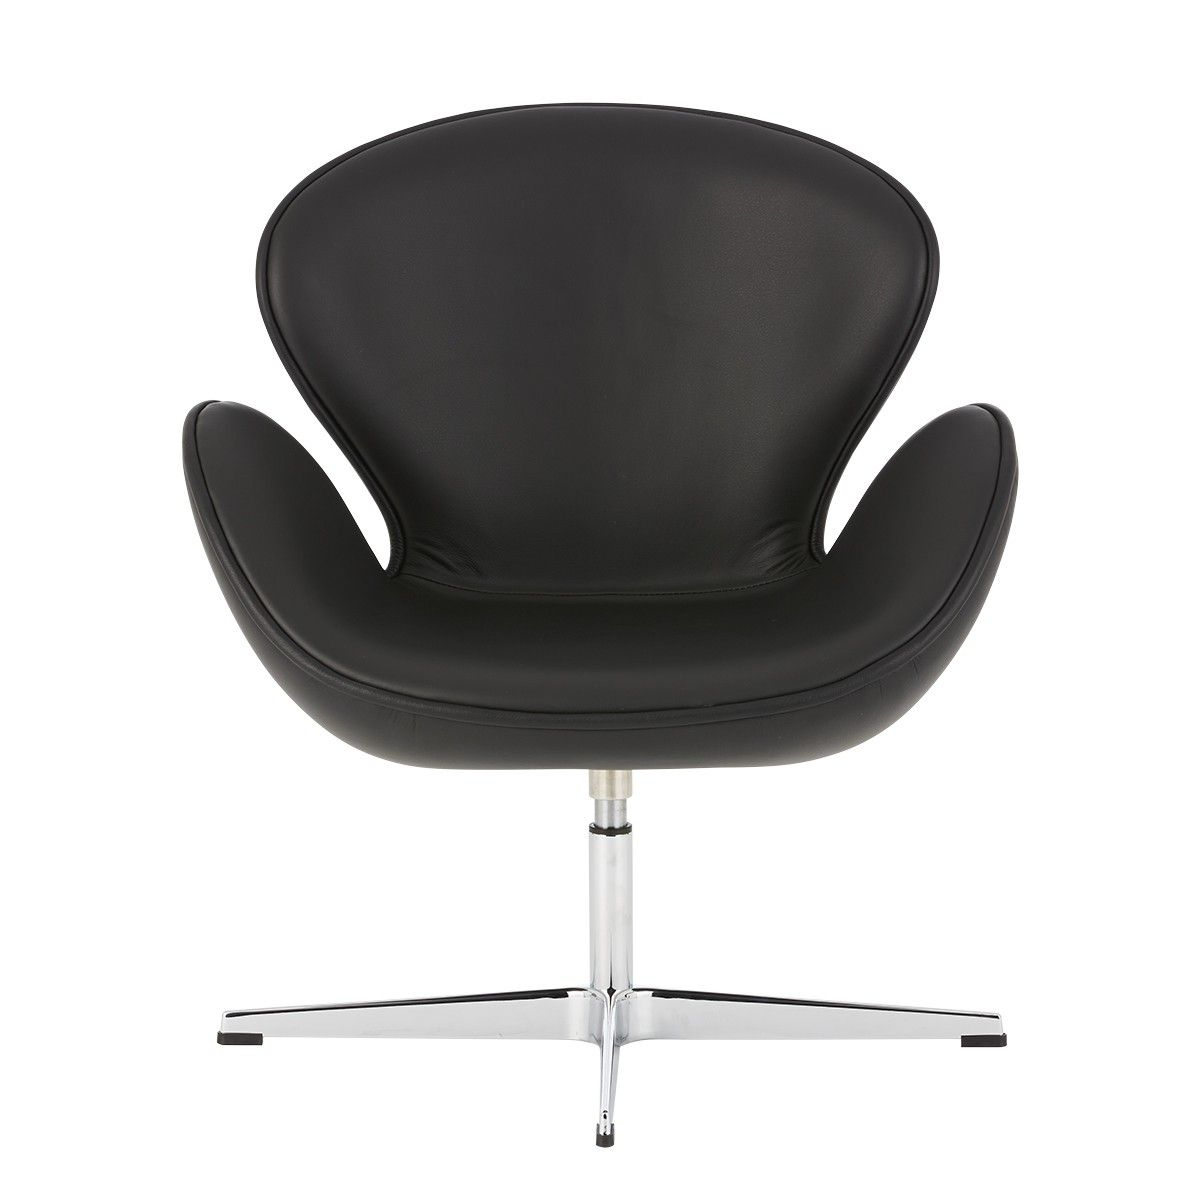 Gispen Zinn Bureaustoel.Swan Chair Replica Arne Jacobsen Italian Leather Lounge Chairs